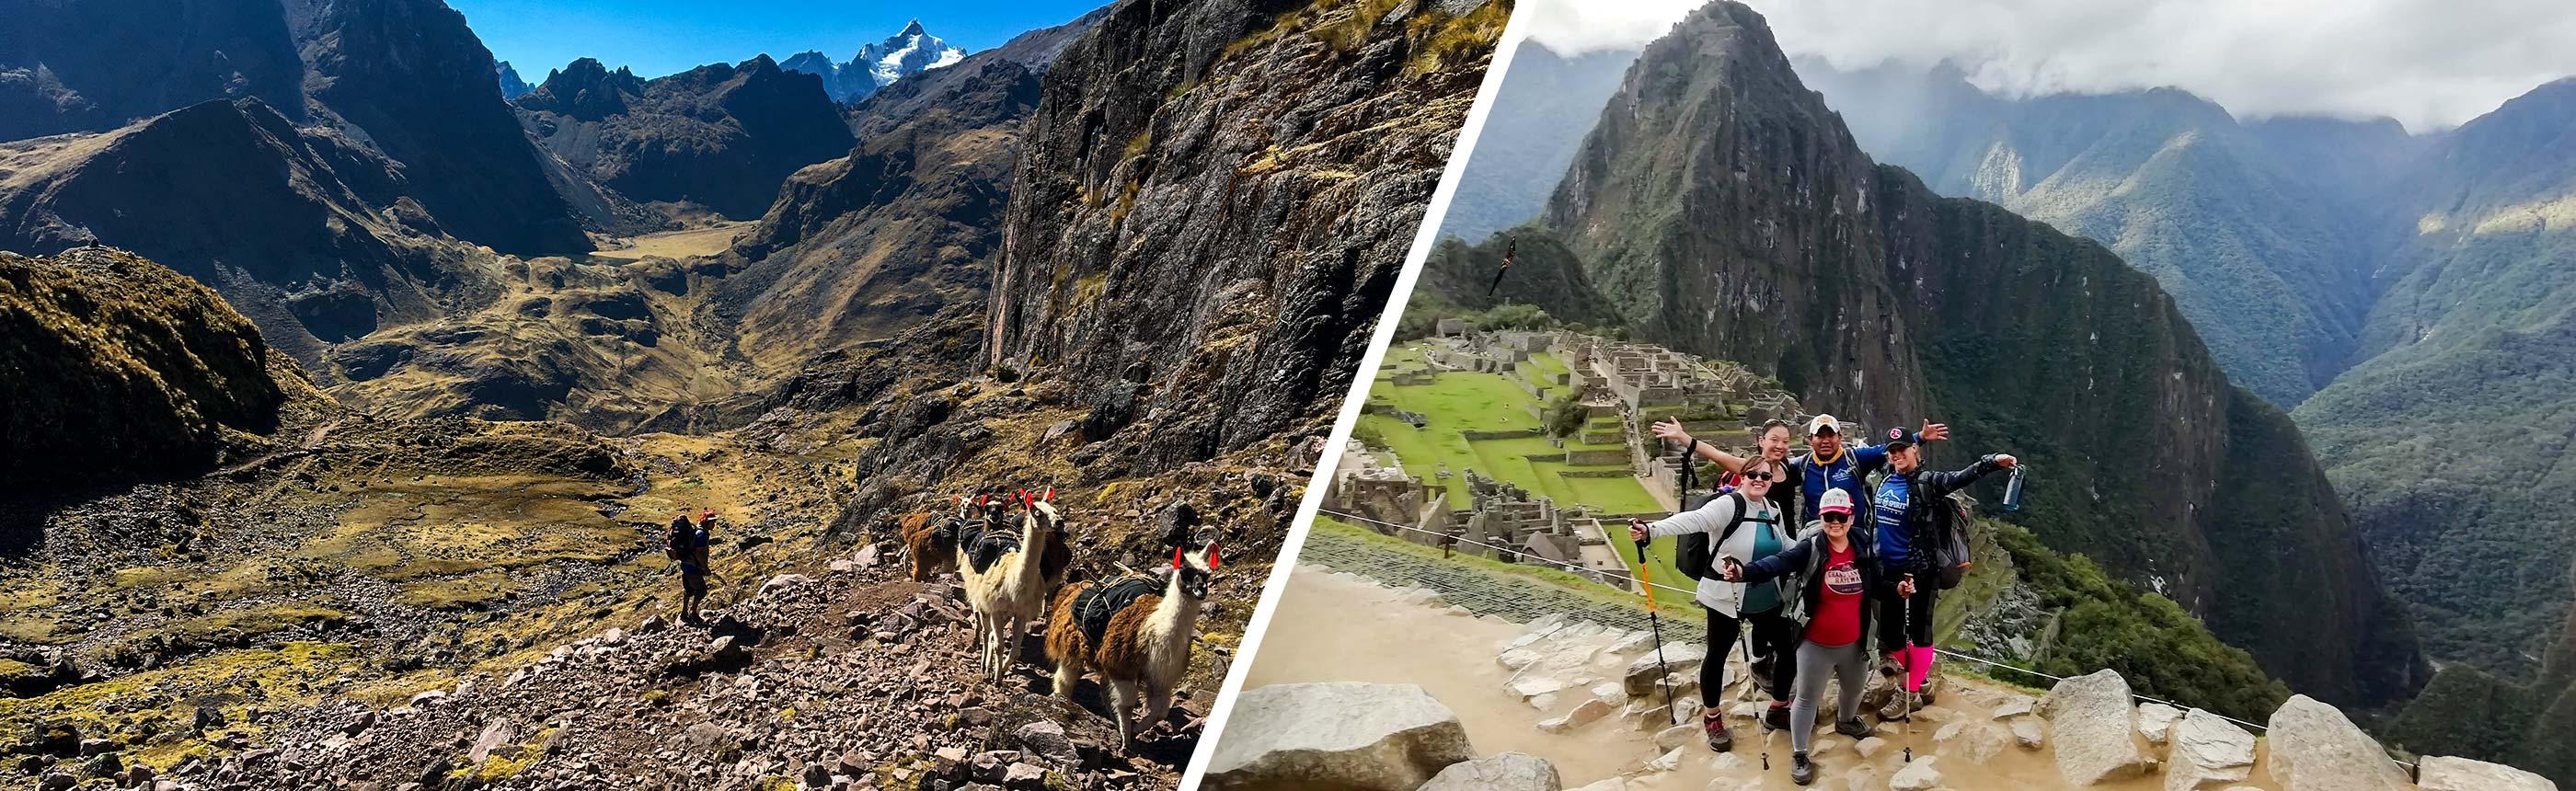 Lares Trek Peru to Machu Picchu